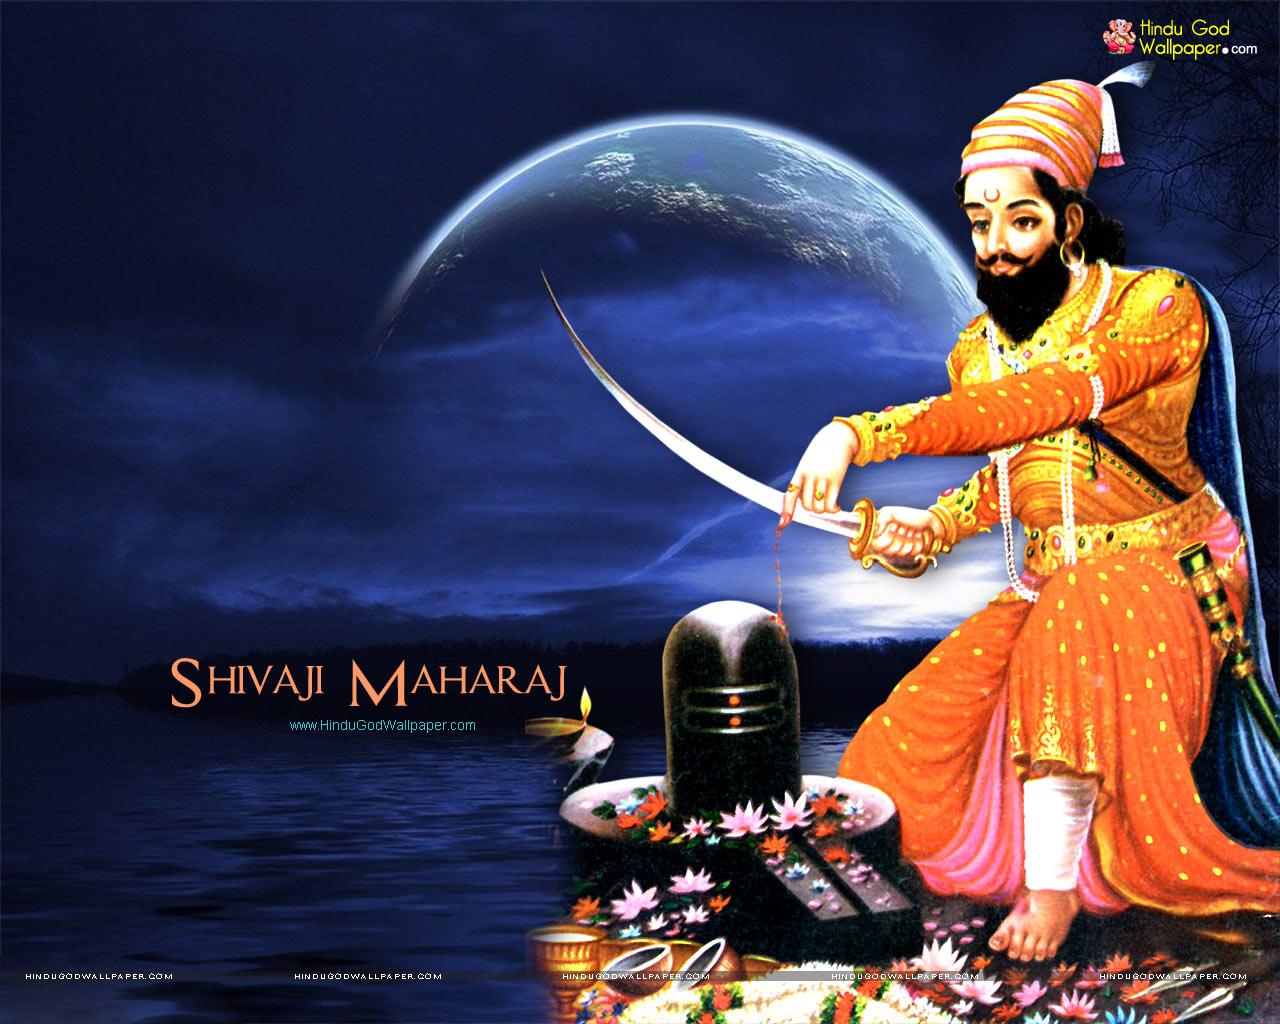 New Shivaji Maharaj Wallpaper Free Download